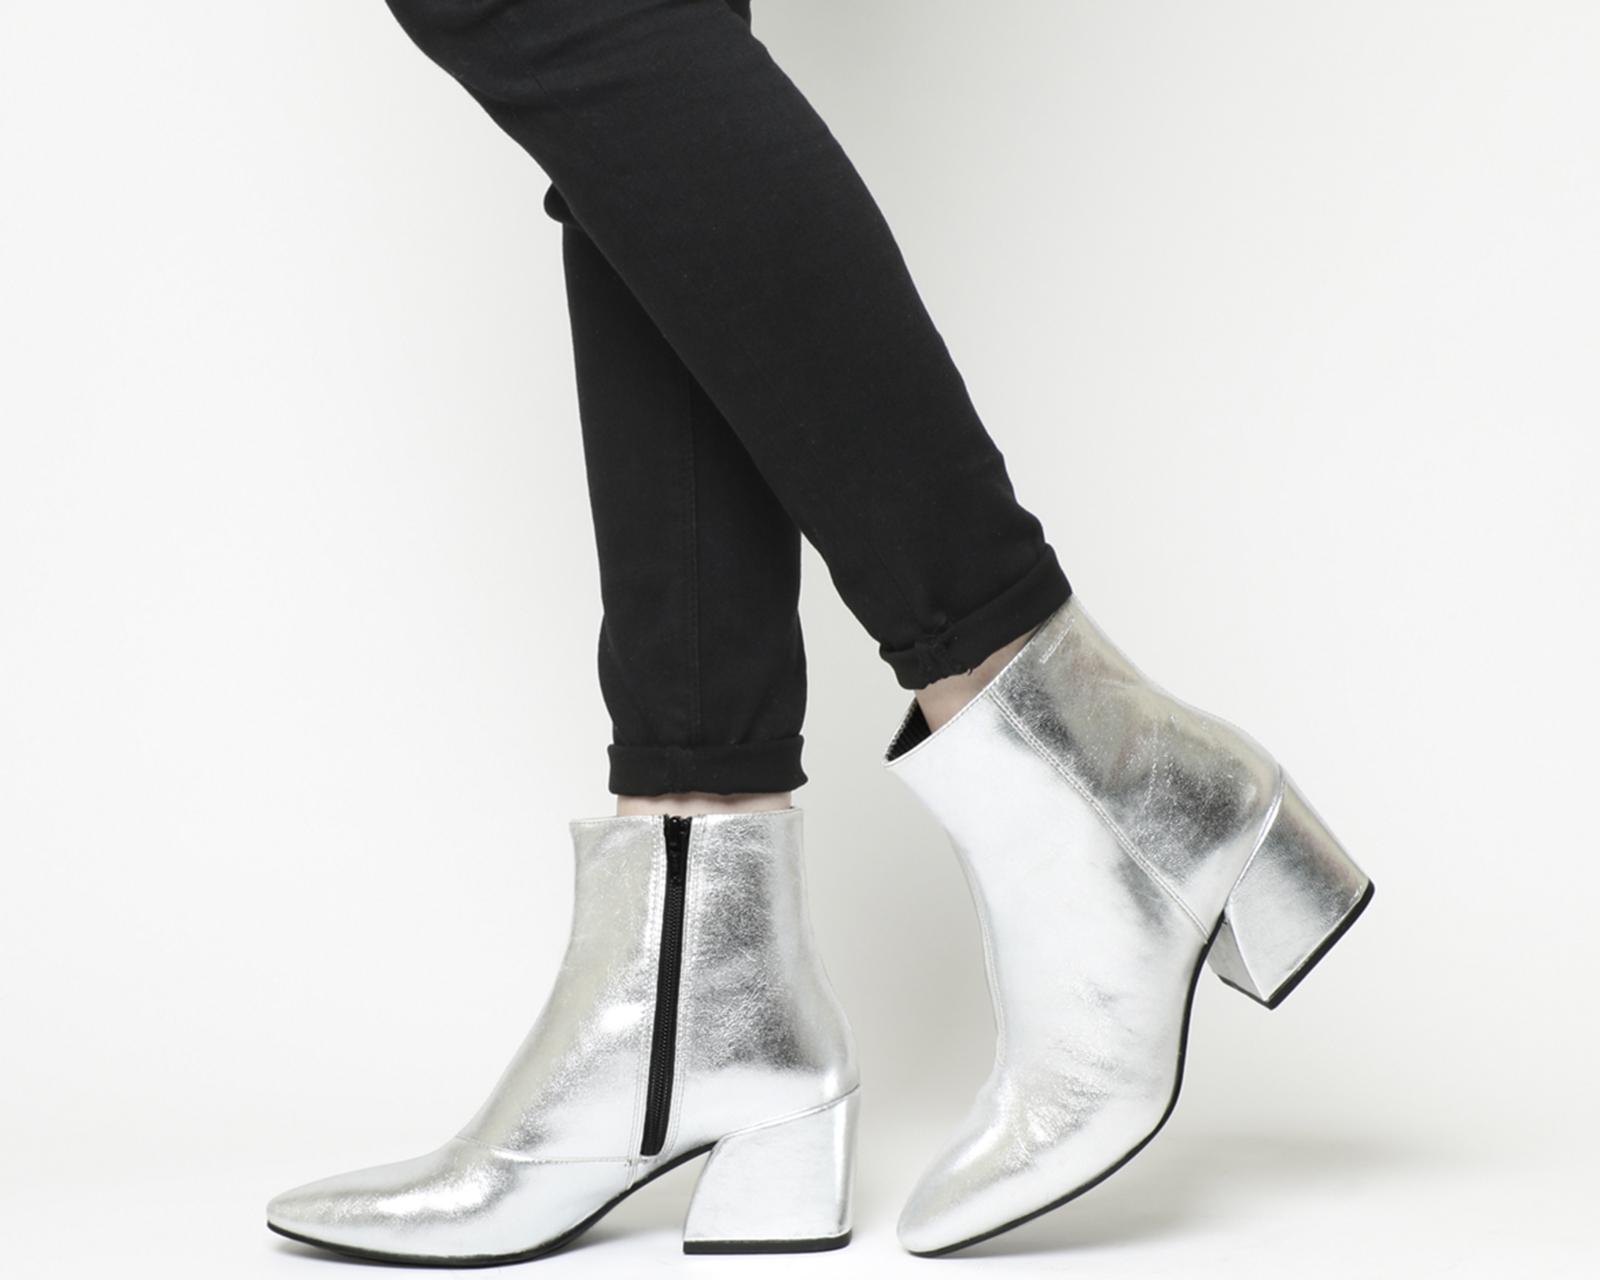 f90eb479e443 Sentinel Womens Vagabond Olivia Block Heel Boots Silver Leather Boots